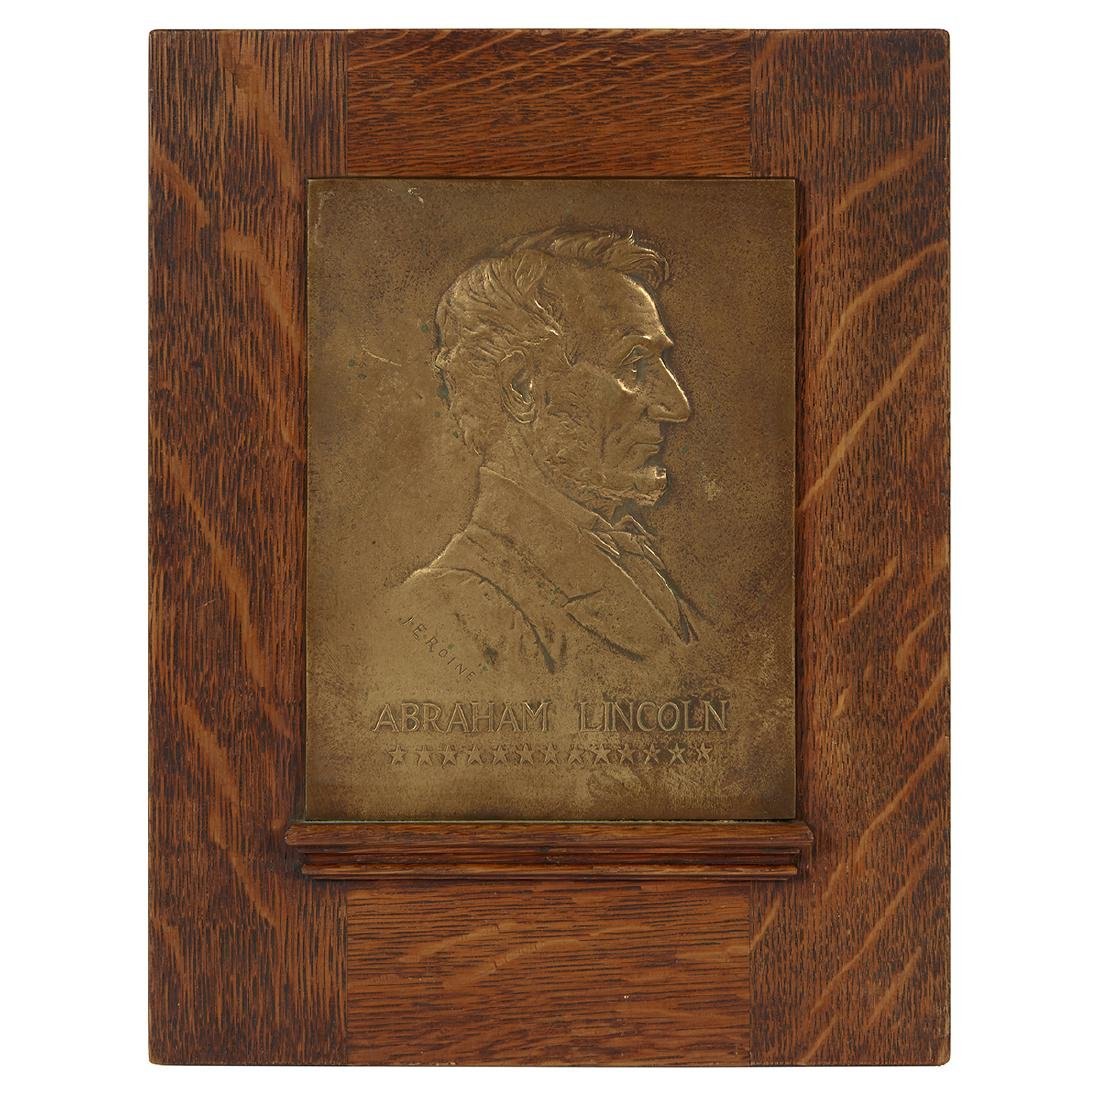 Jules Édouard Roiné/Gorham Mfg., Abraham Lincoln